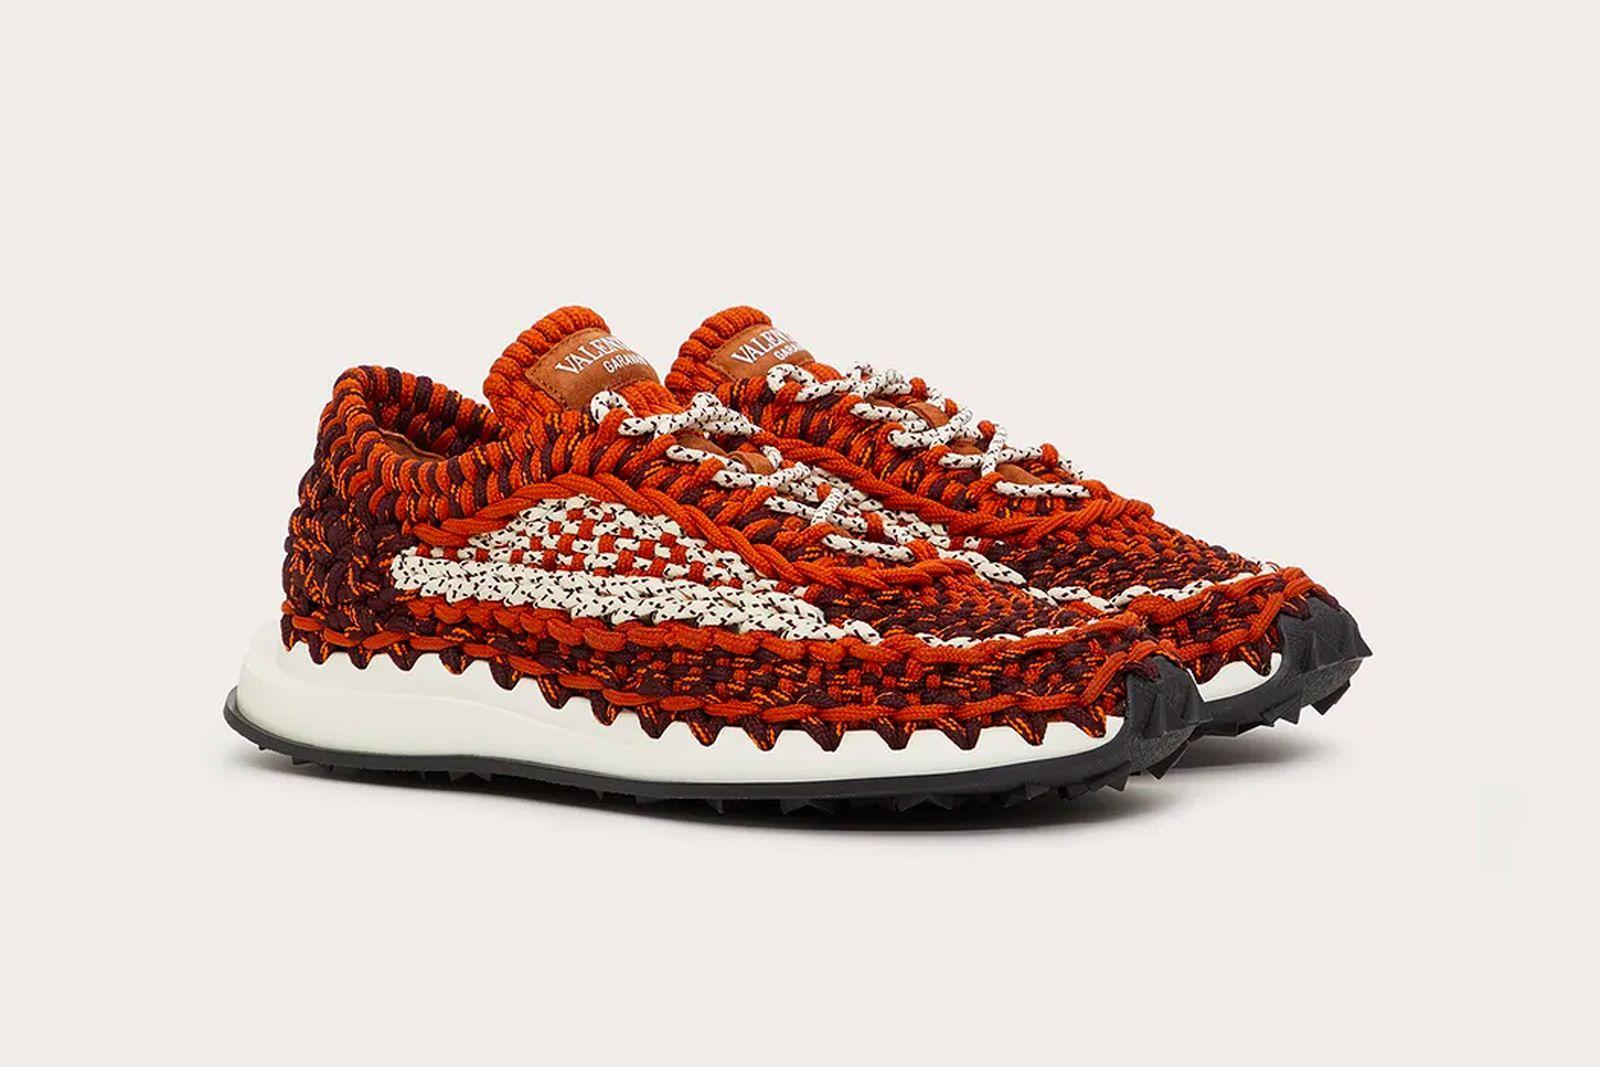 valentino-garavani-crochet-sneakers-release-date-price-07